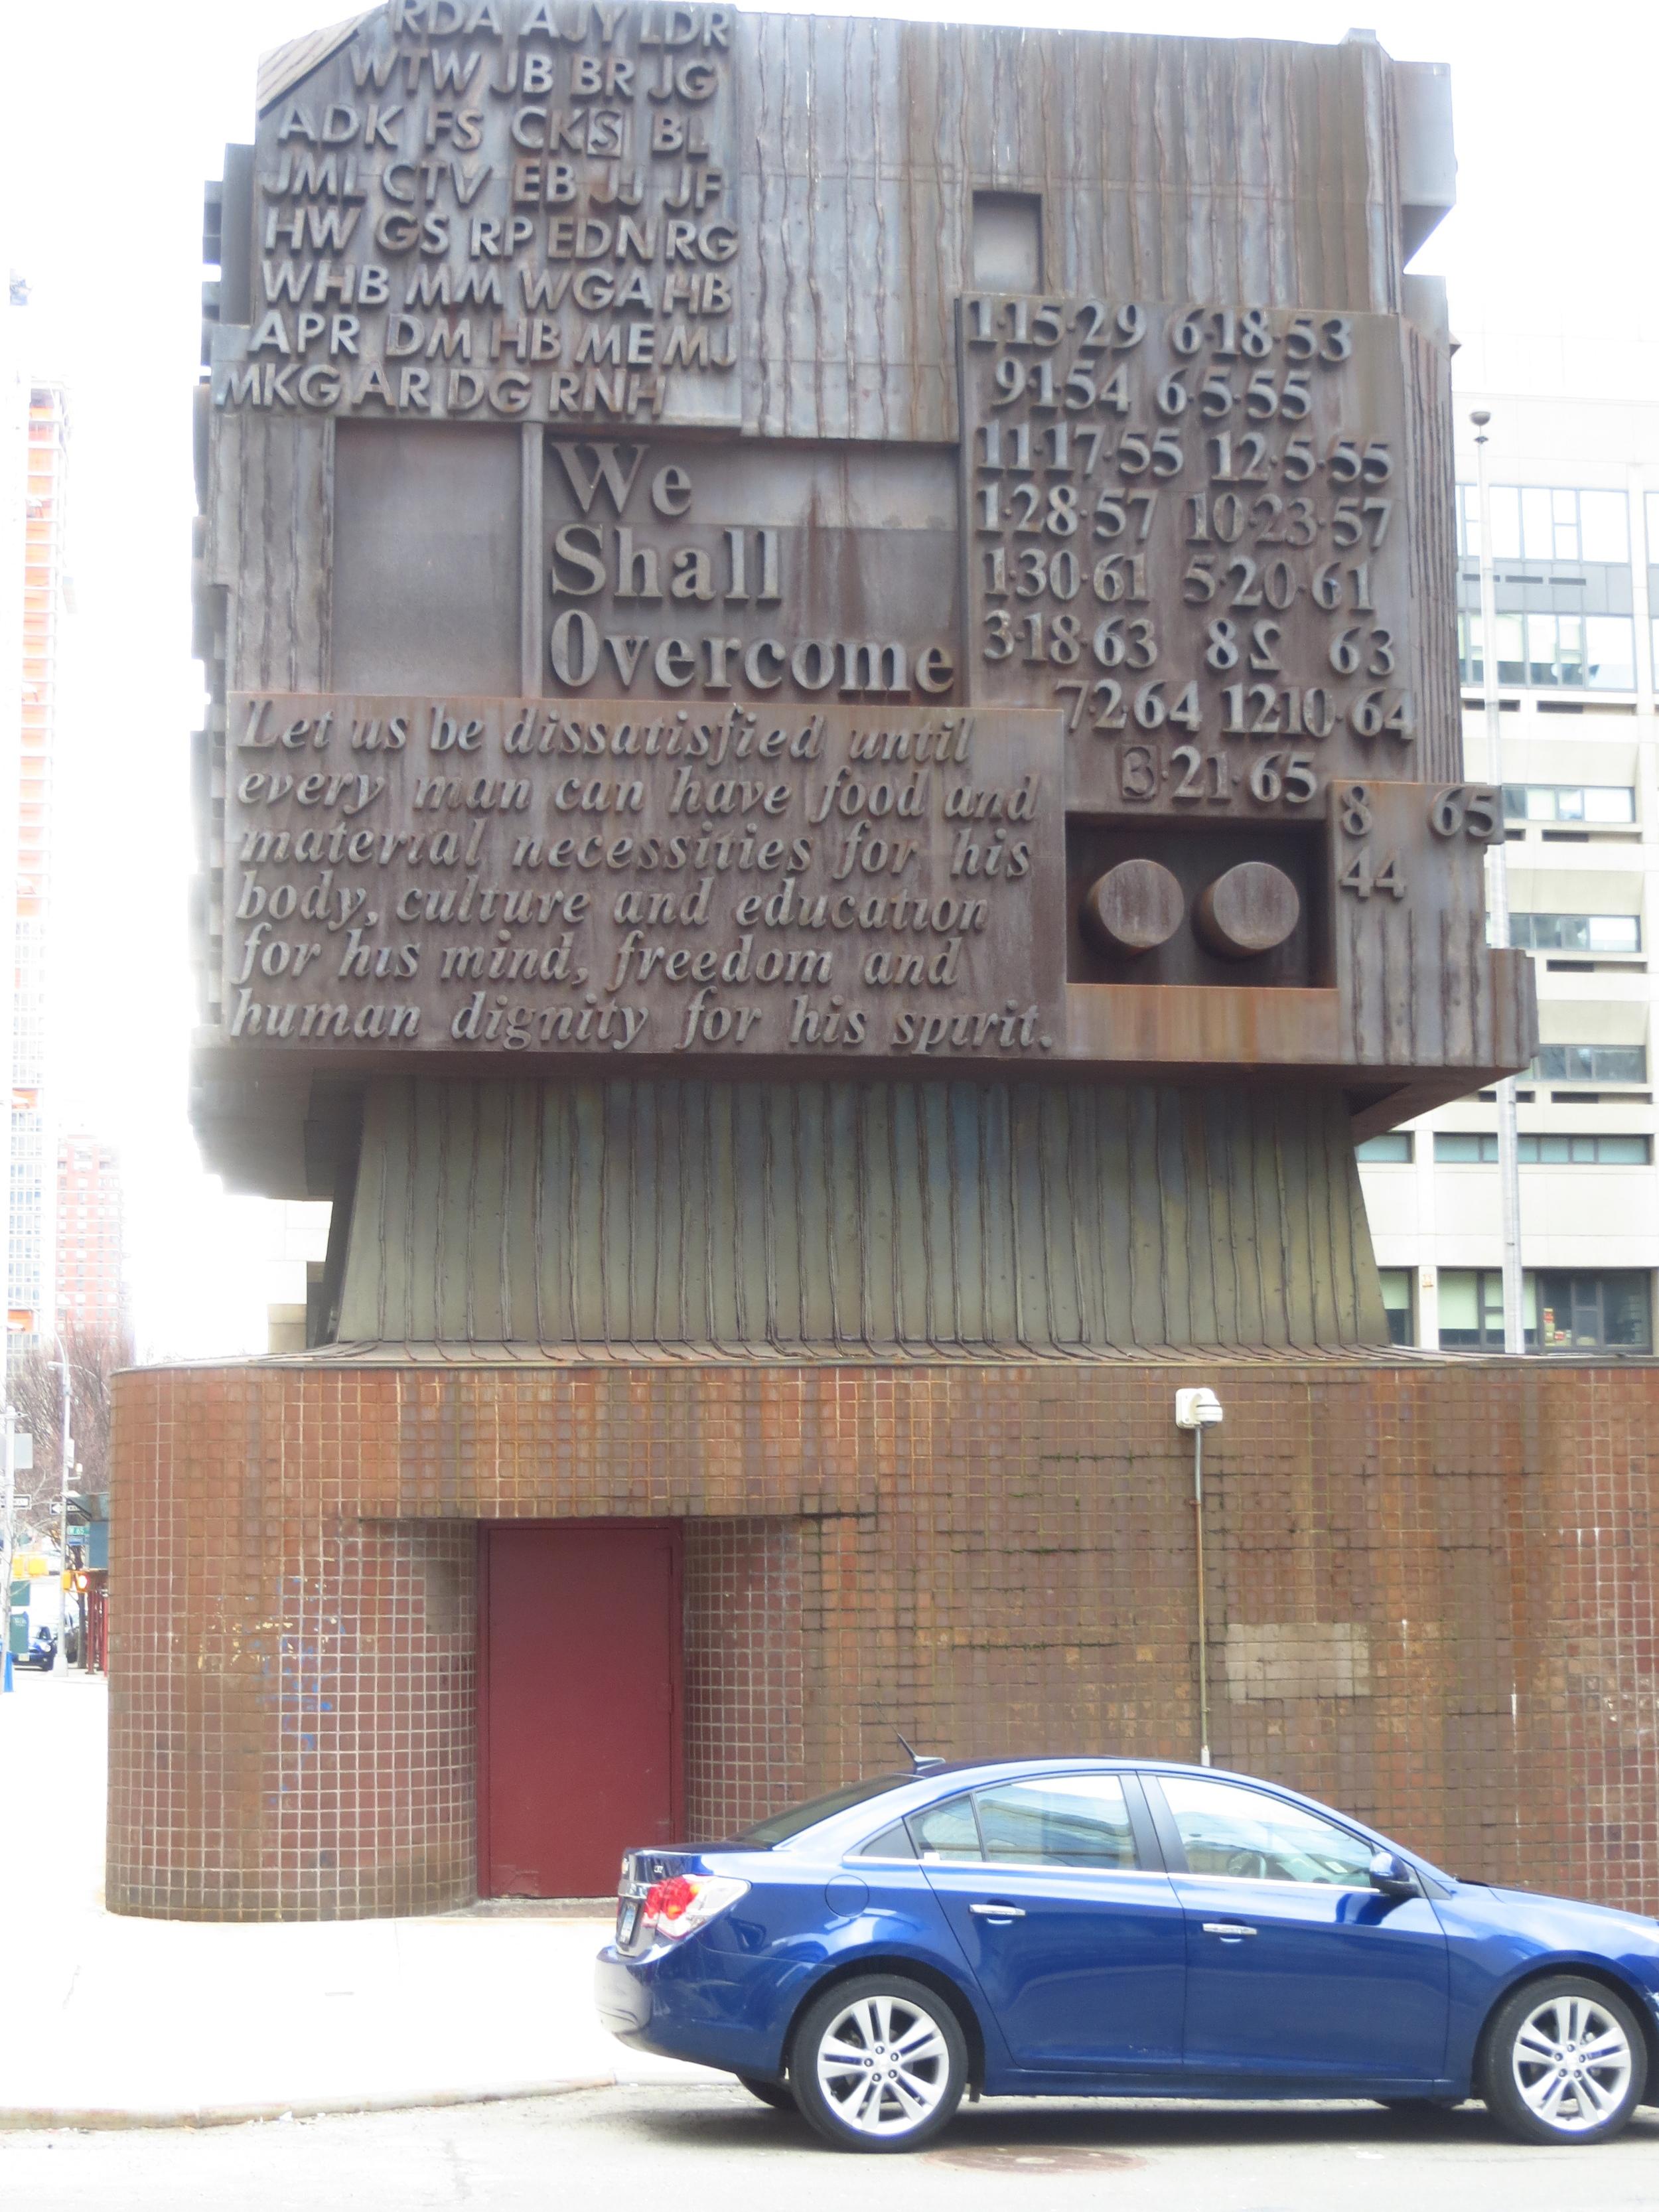 Confusing monument